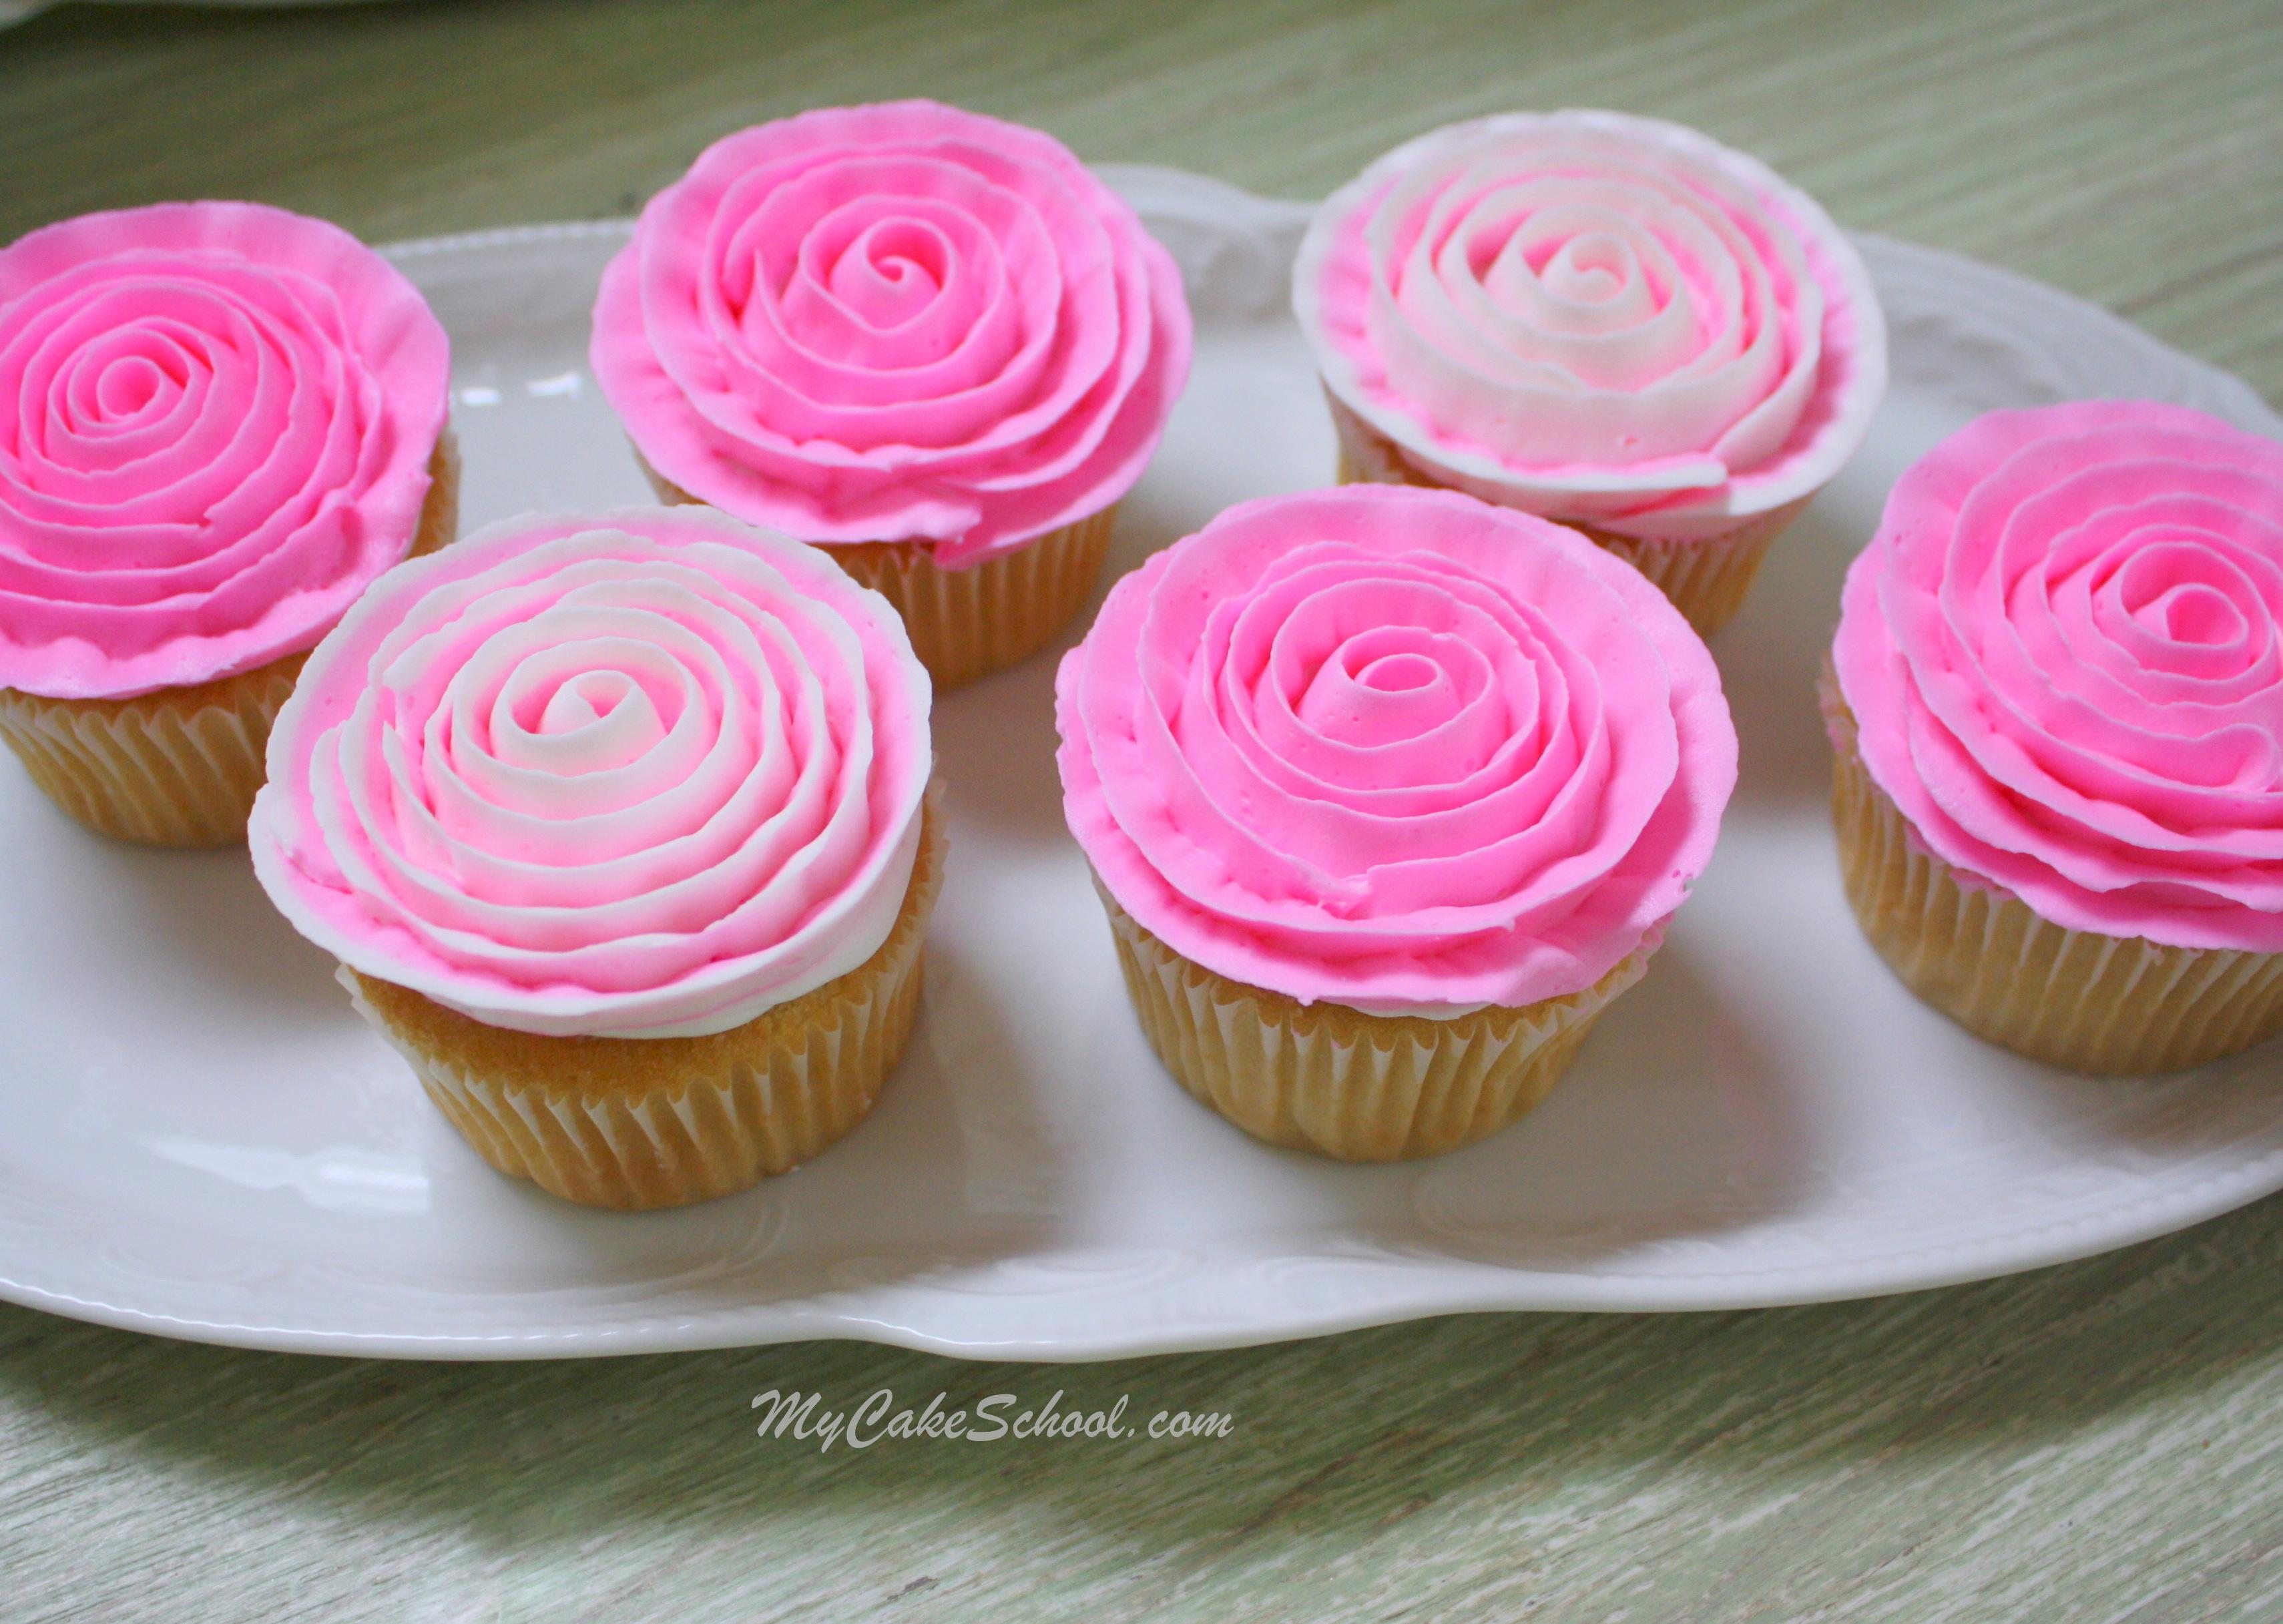 Cake Decorating Roses Buttercream